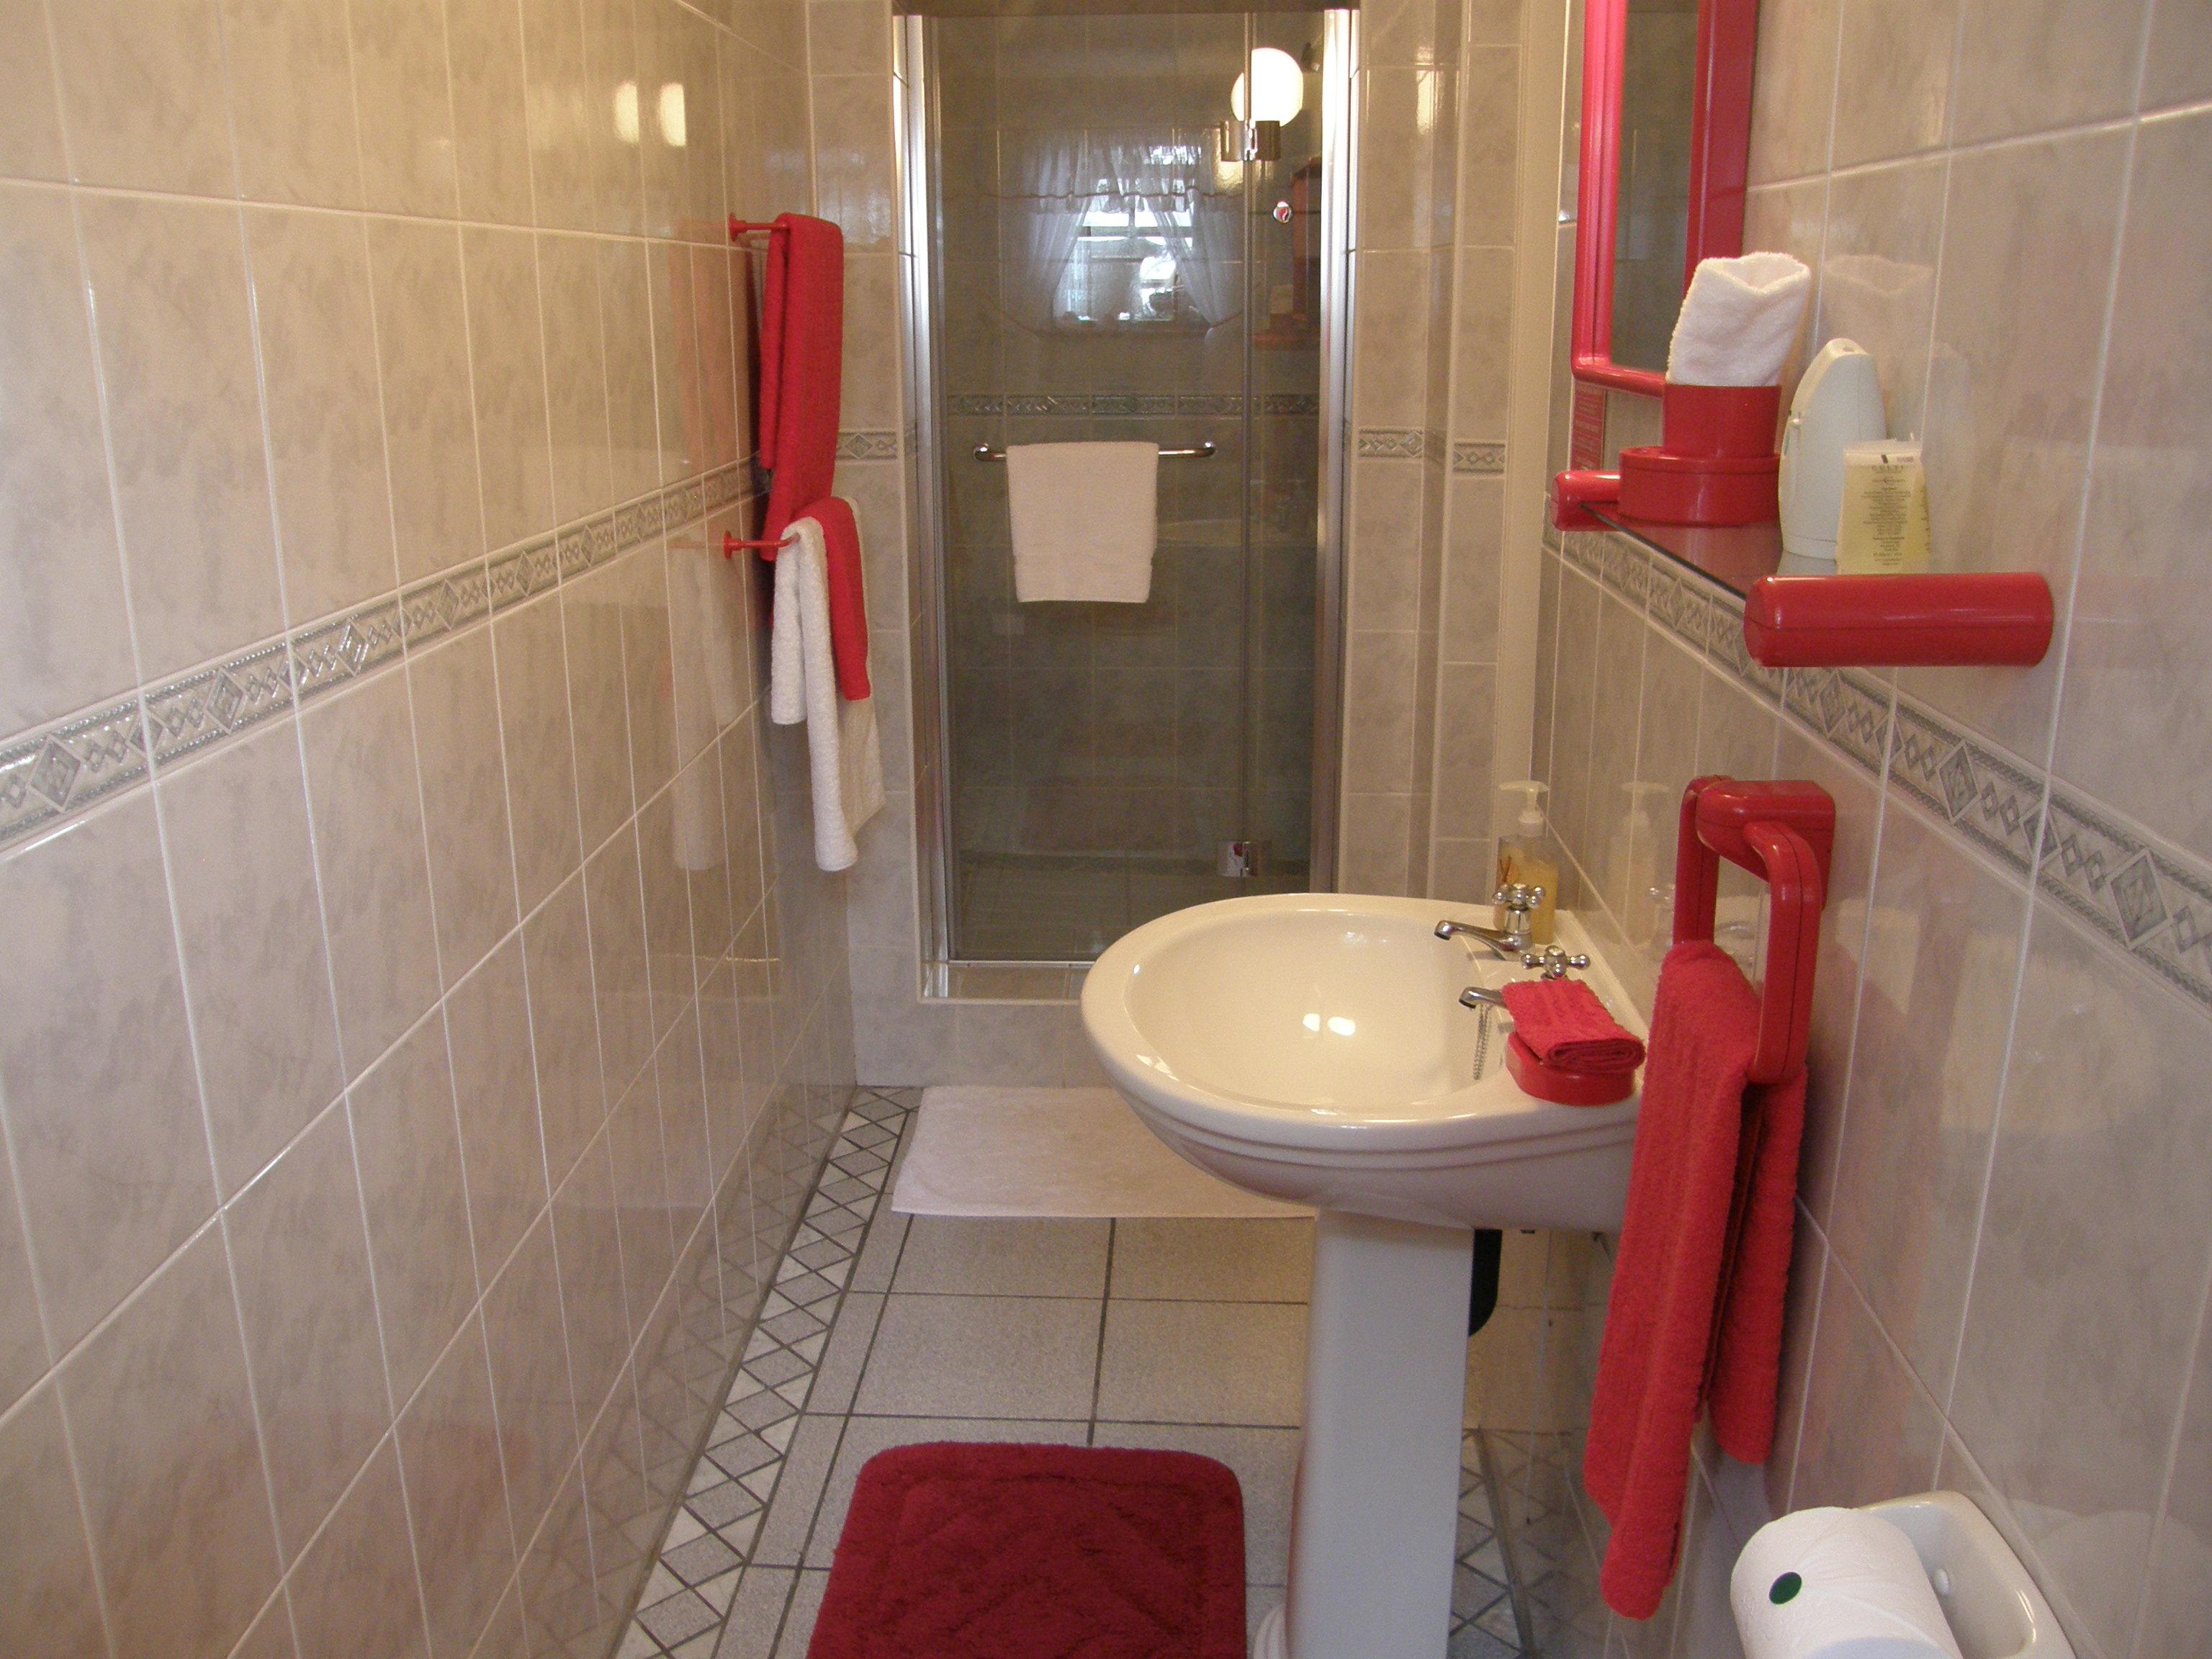 Poppy Bathroom (1)